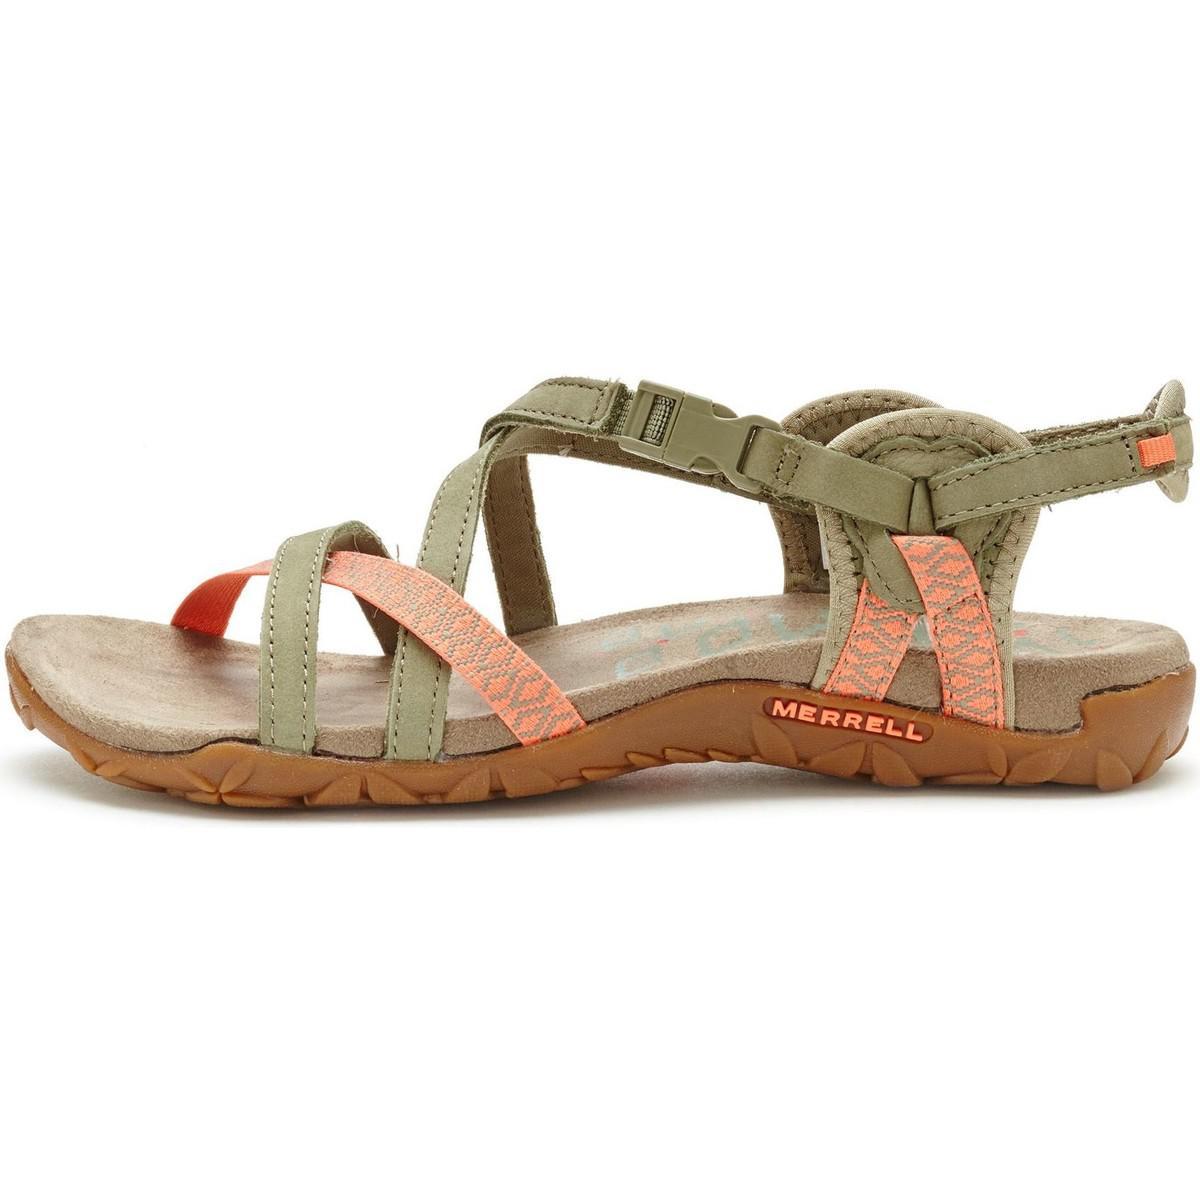 b87bd0760ae Merrell Terran Lattice Ii Women Sandals In Putty Green Coral J55312 ...